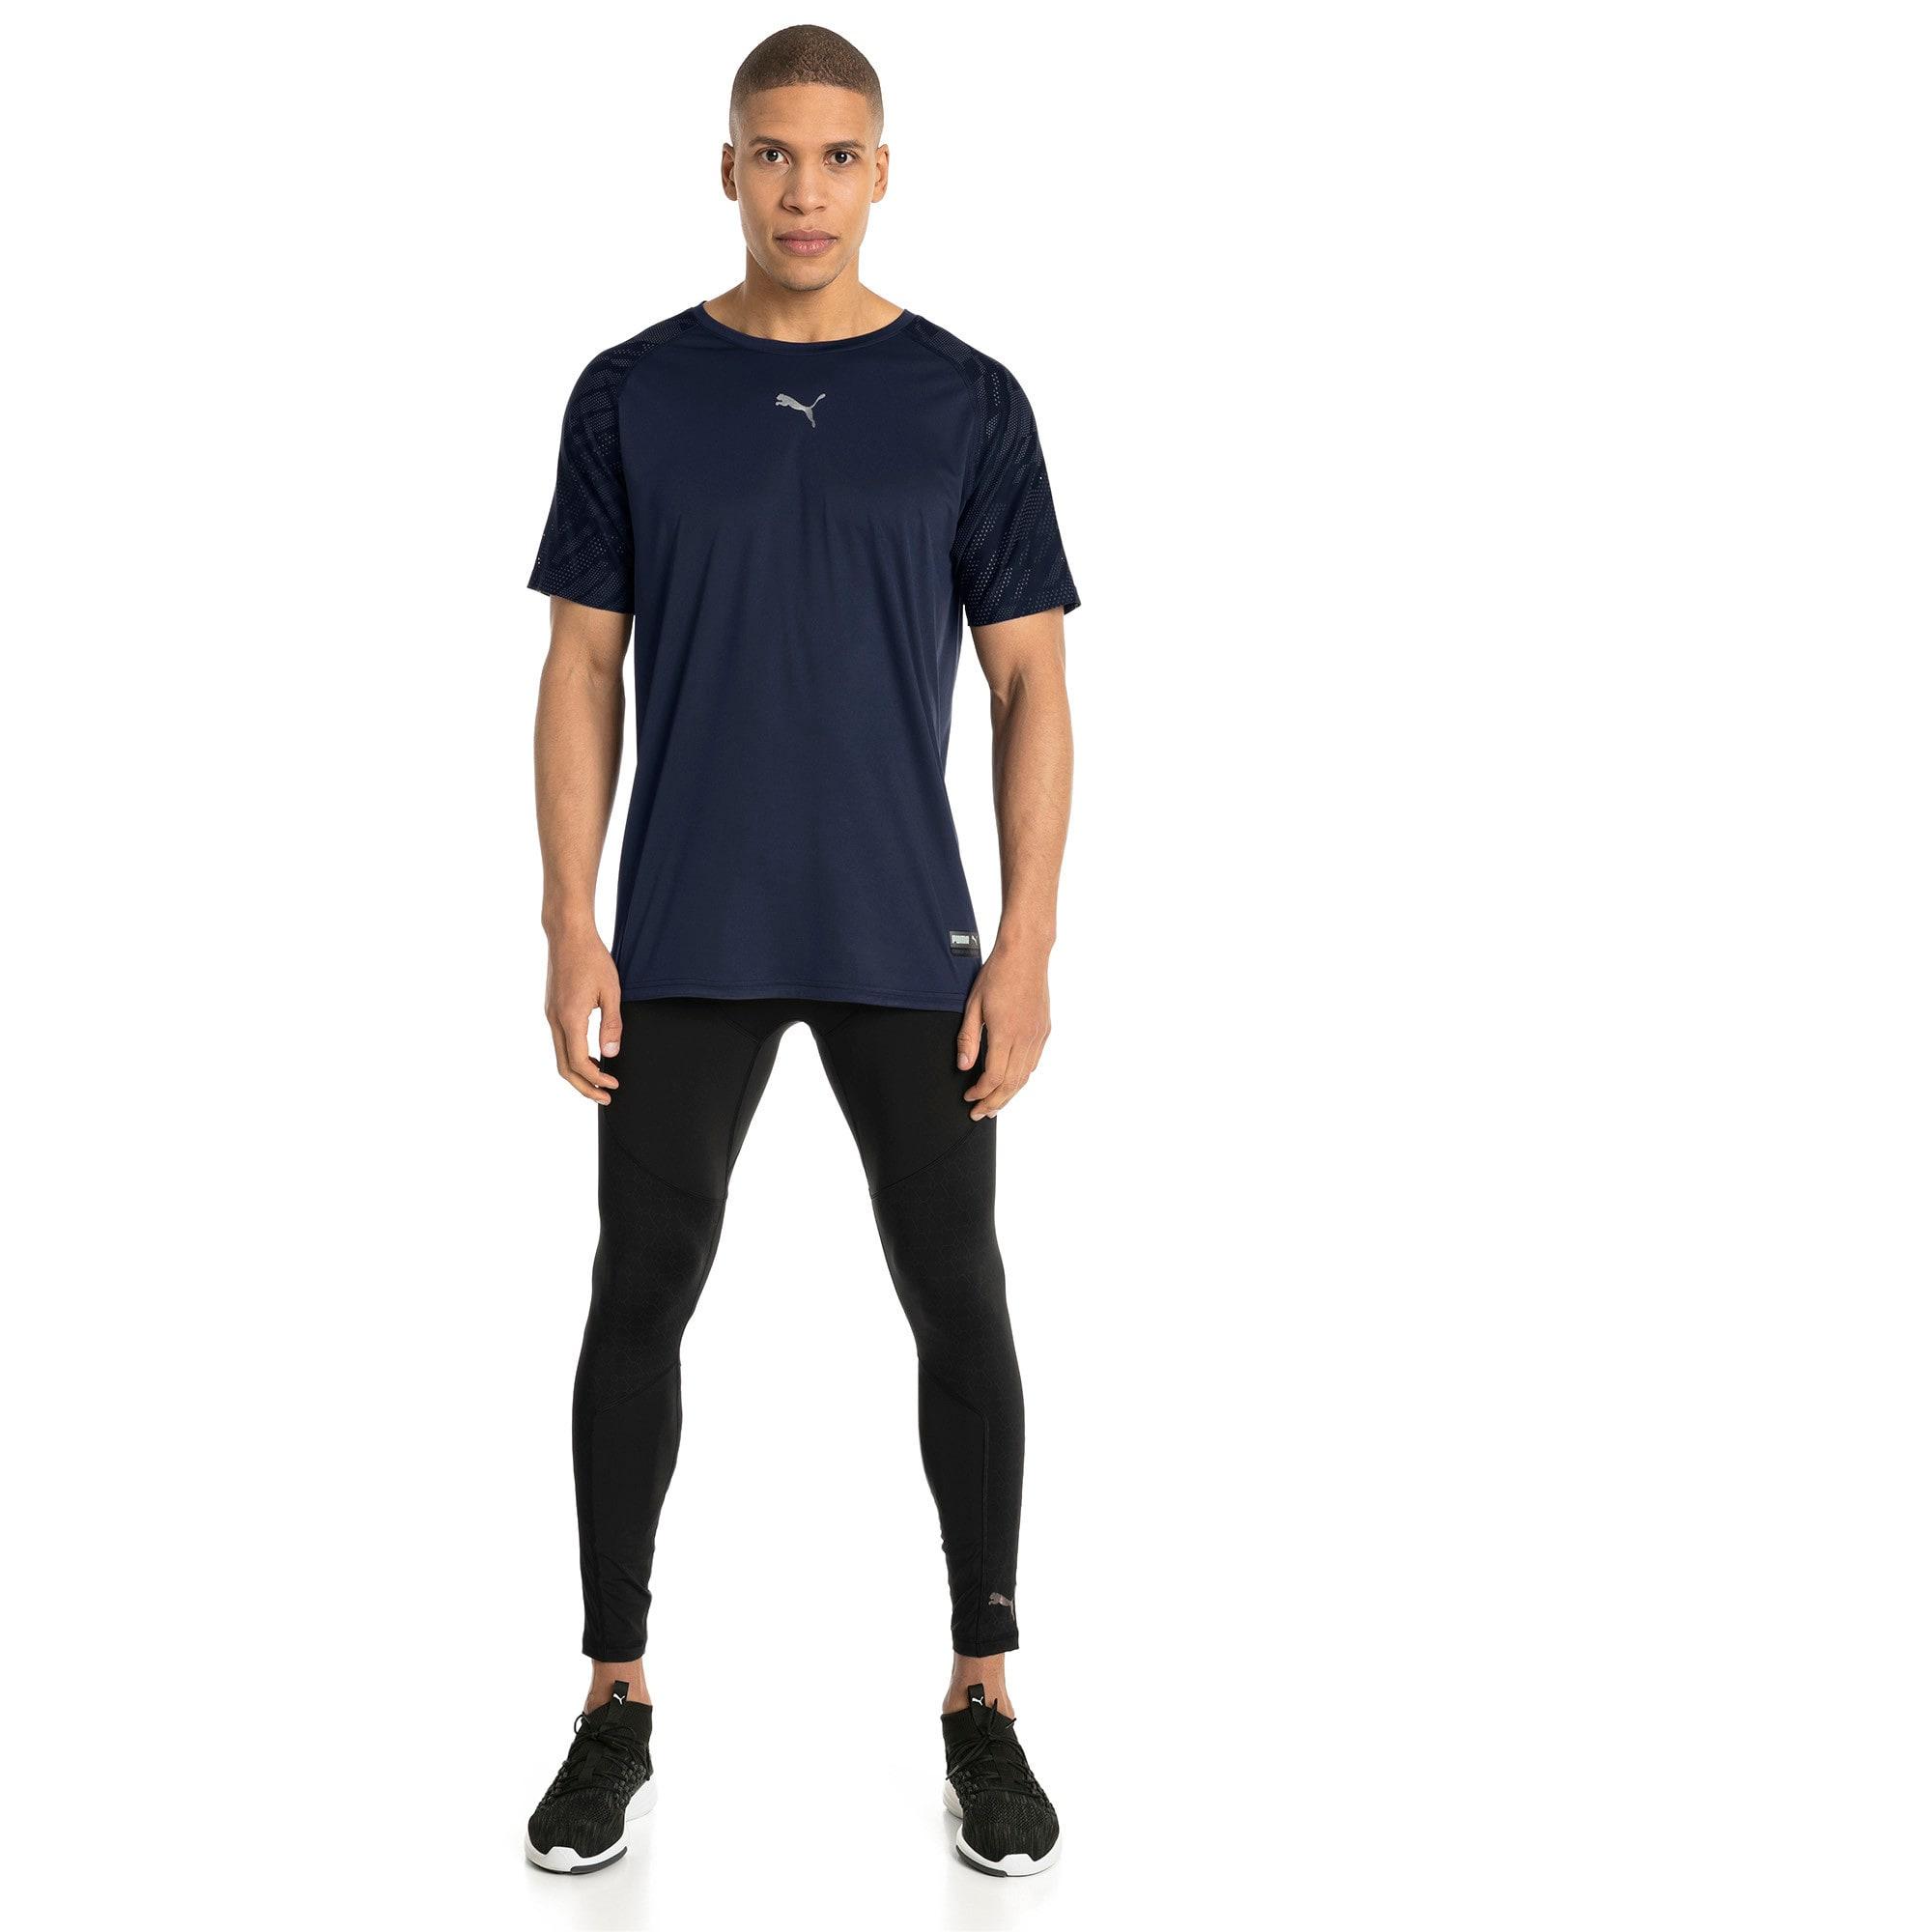 Thumbnail 5 of VENT Graphic Men's T-Shirt, Peacoat-iron gate, medium